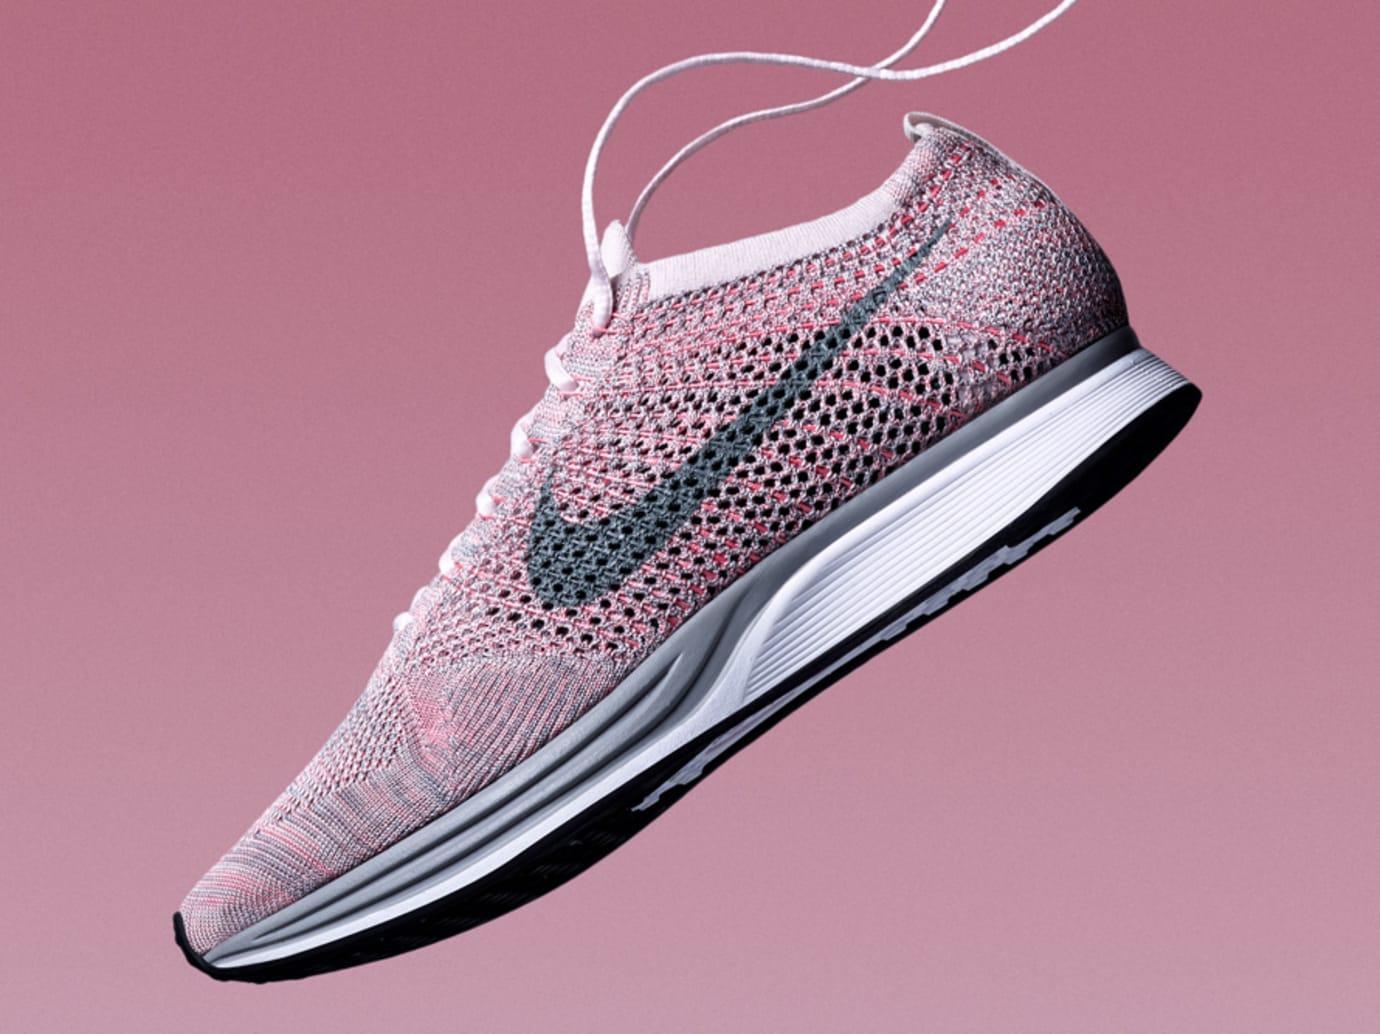 low priced 72fd0 f2c73 Image via Nike Nike Flyknit Racer